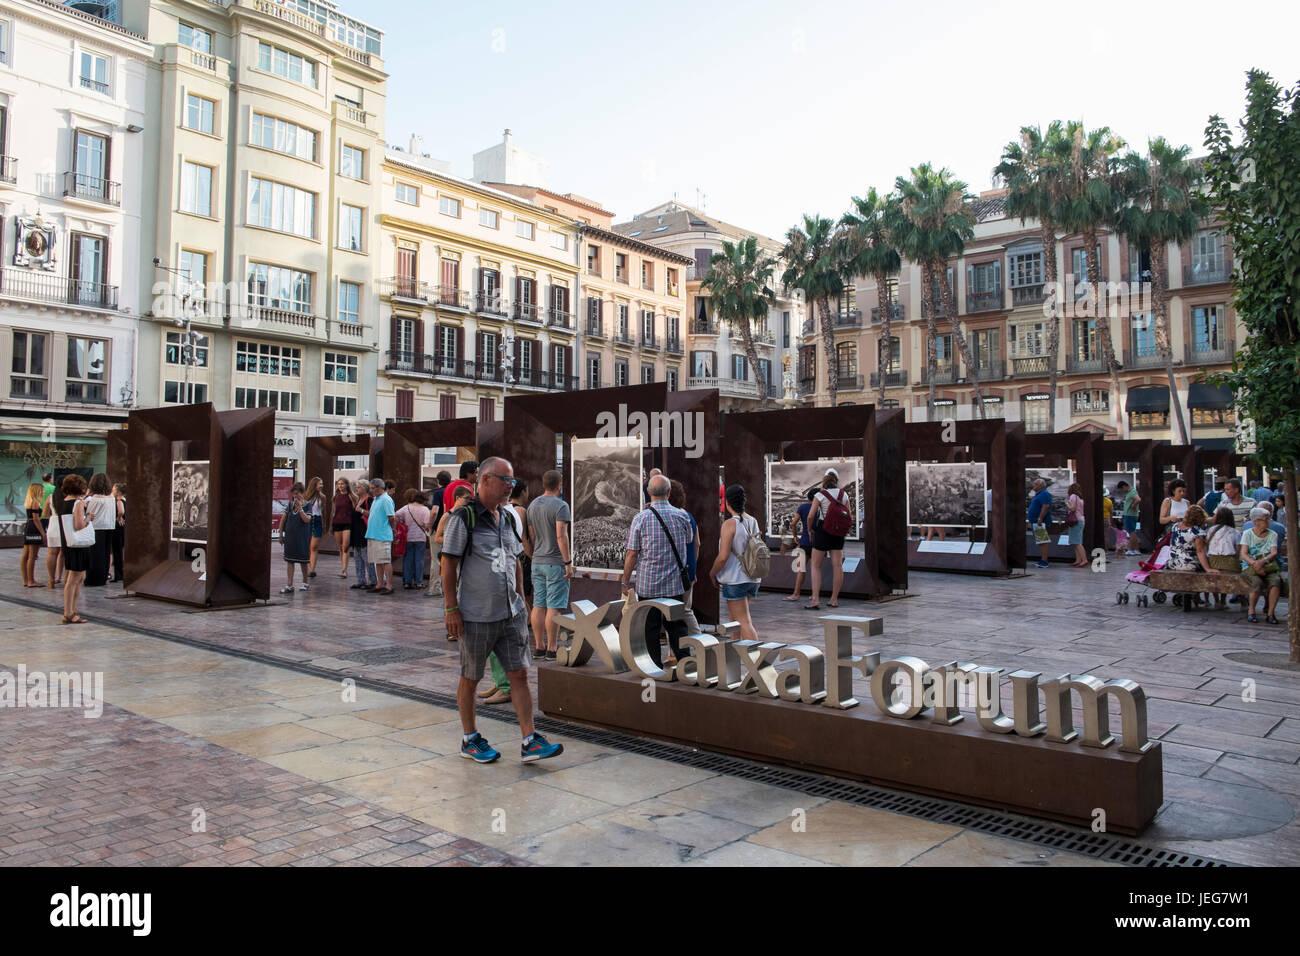 Exposition 'Genèse' du photographe brésilien Sebastião Salgado. Plaza de la Constitución, Photo Stock